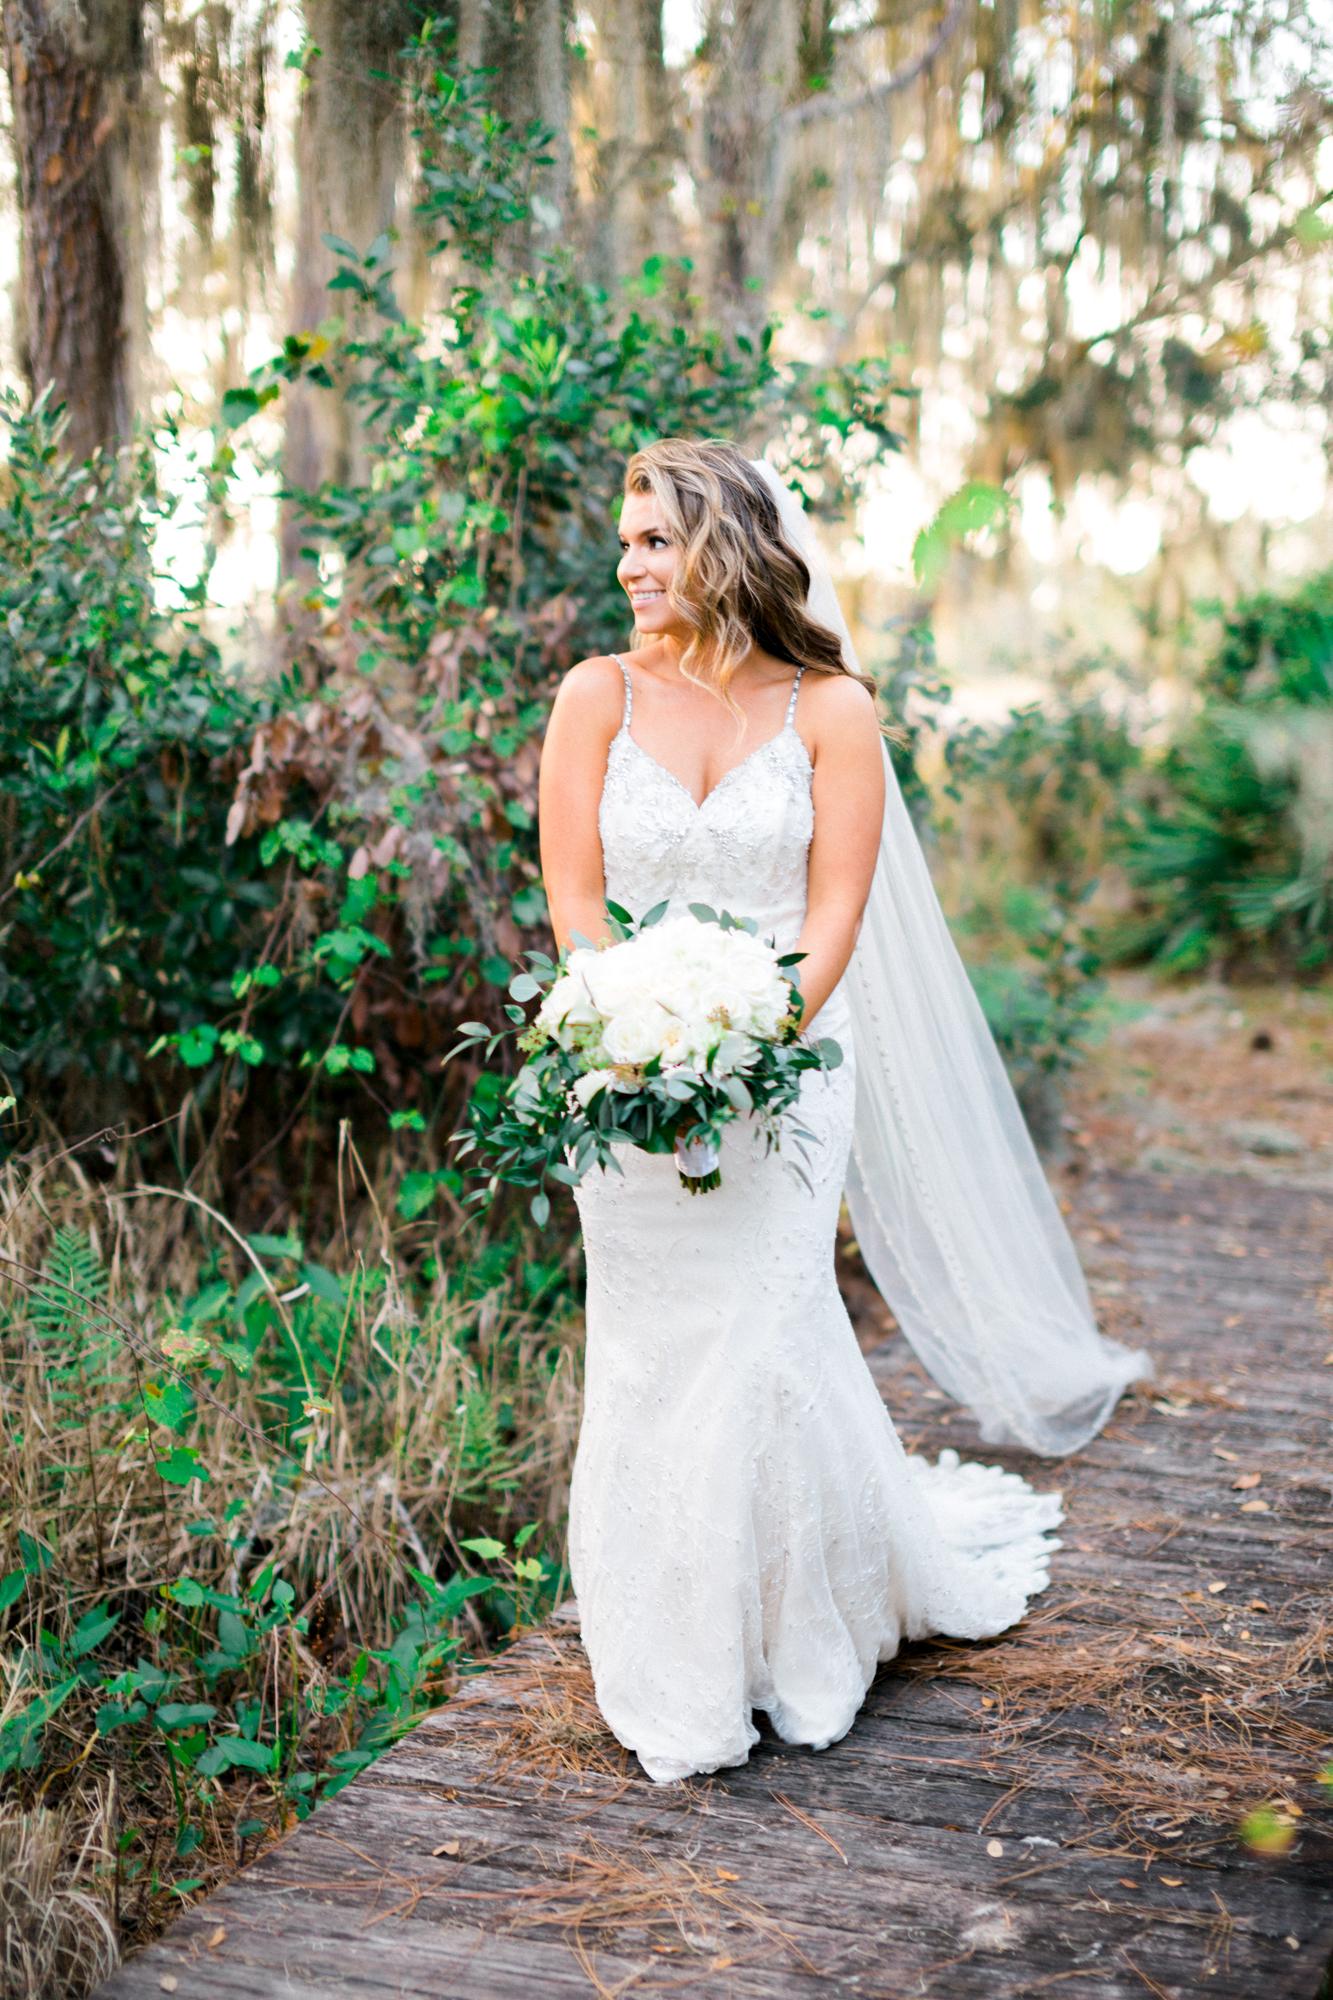 jessica-bellinger-photography-harmony-golf-preserve-wedding-photos-9319.jpg